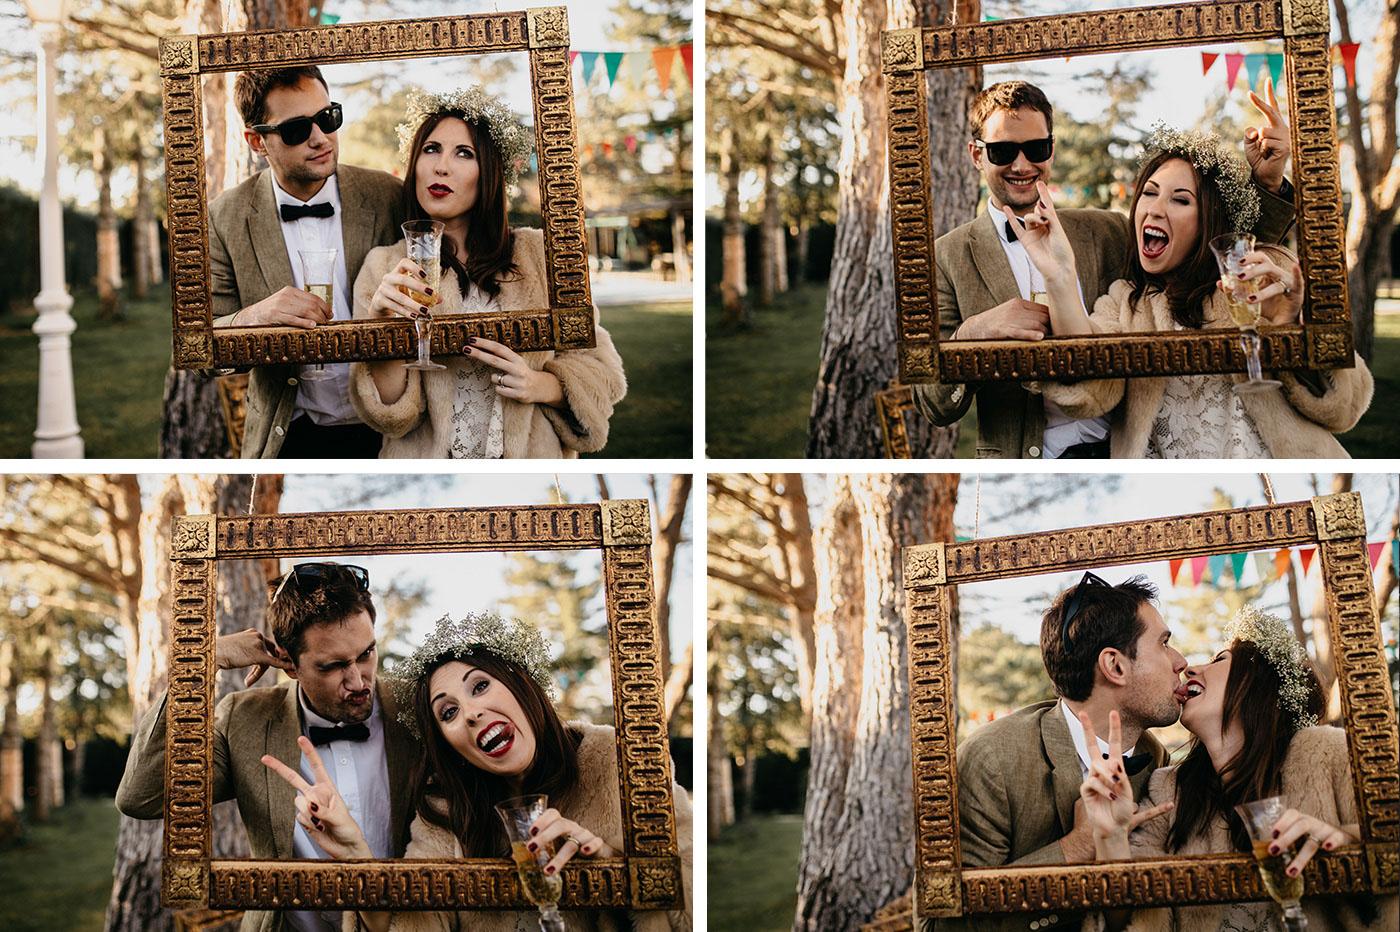 Velvet-Hush-fotografos-boda-al-aire-libre-madrid-074